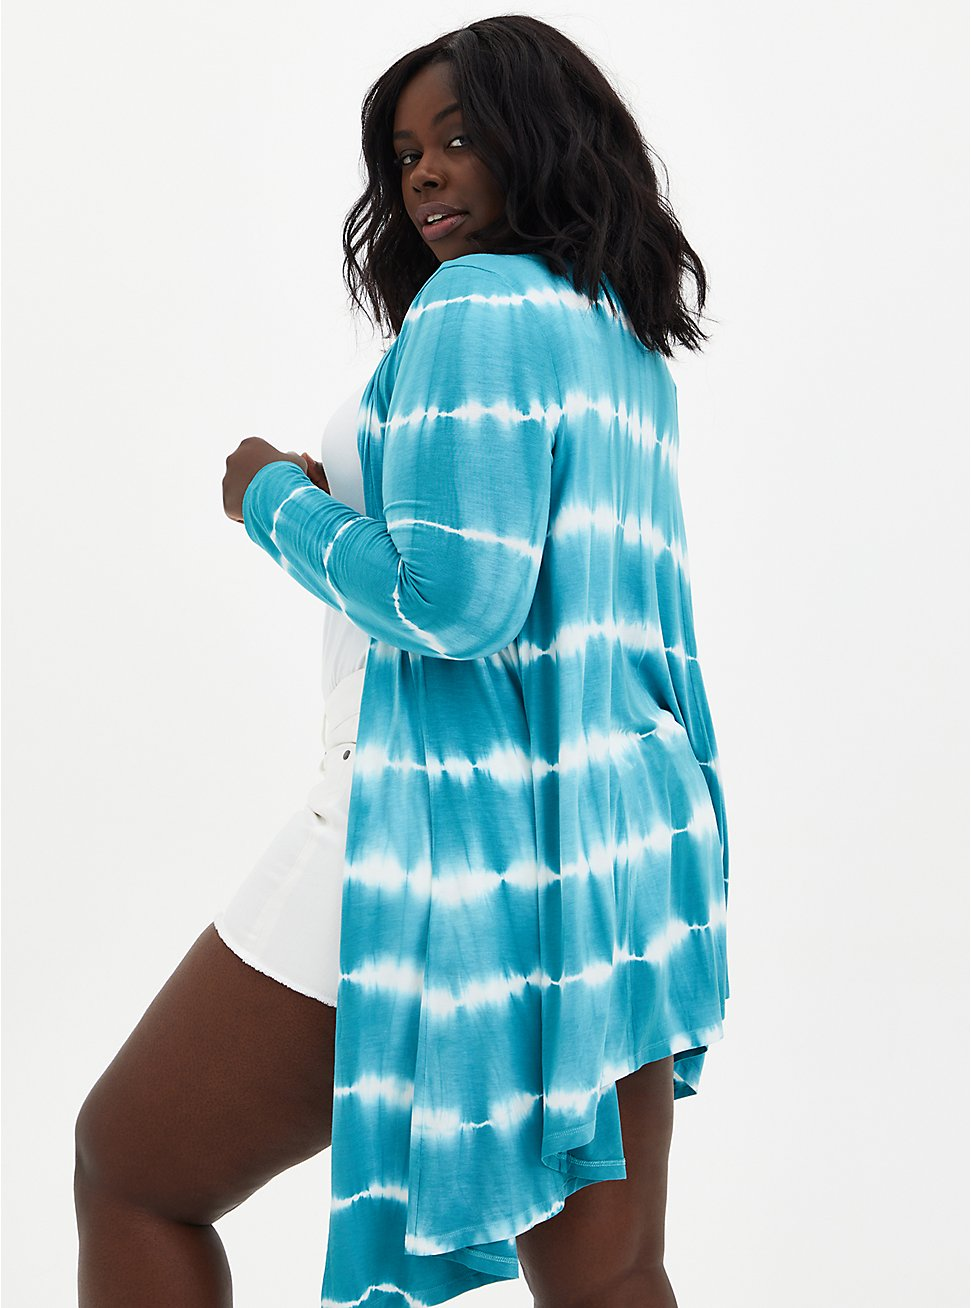 Super Soft Teal Tie-Dye Fit & Flare Cardigan Sweater, TAHITI BLUE, hi-res